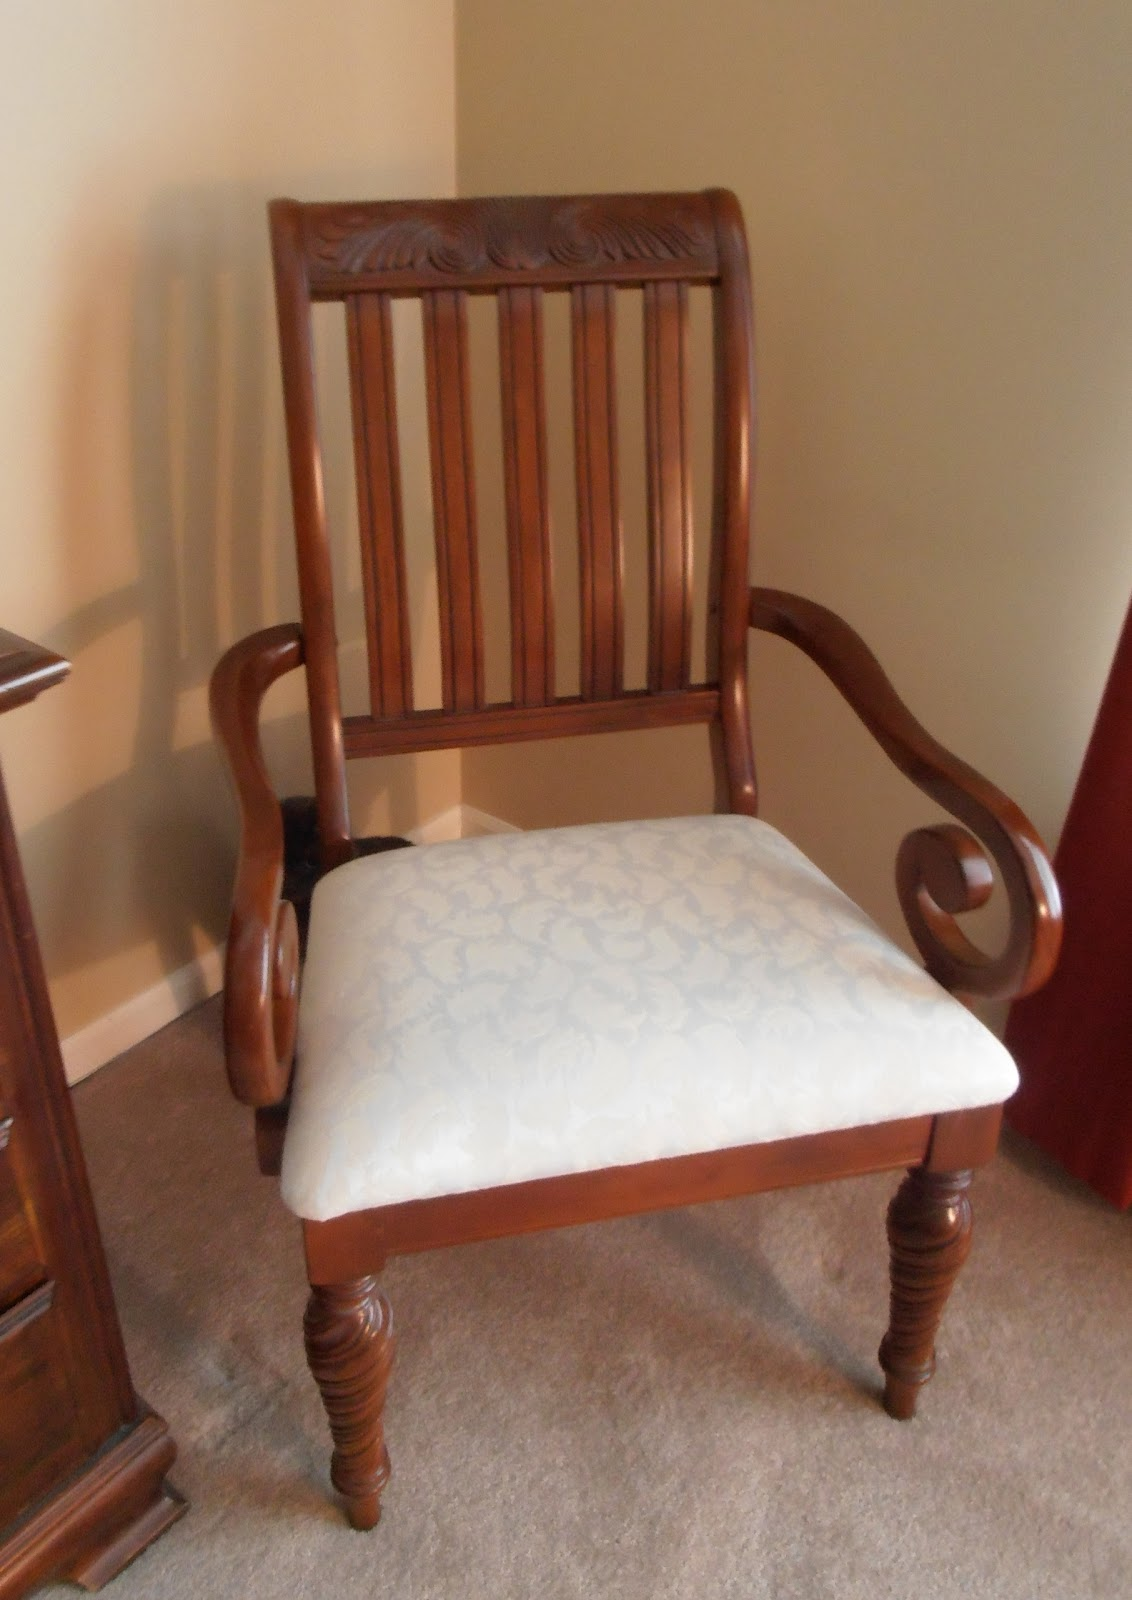 tallgrass design chair migration. Black Bedroom Furniture Sets. Home Design Ideas